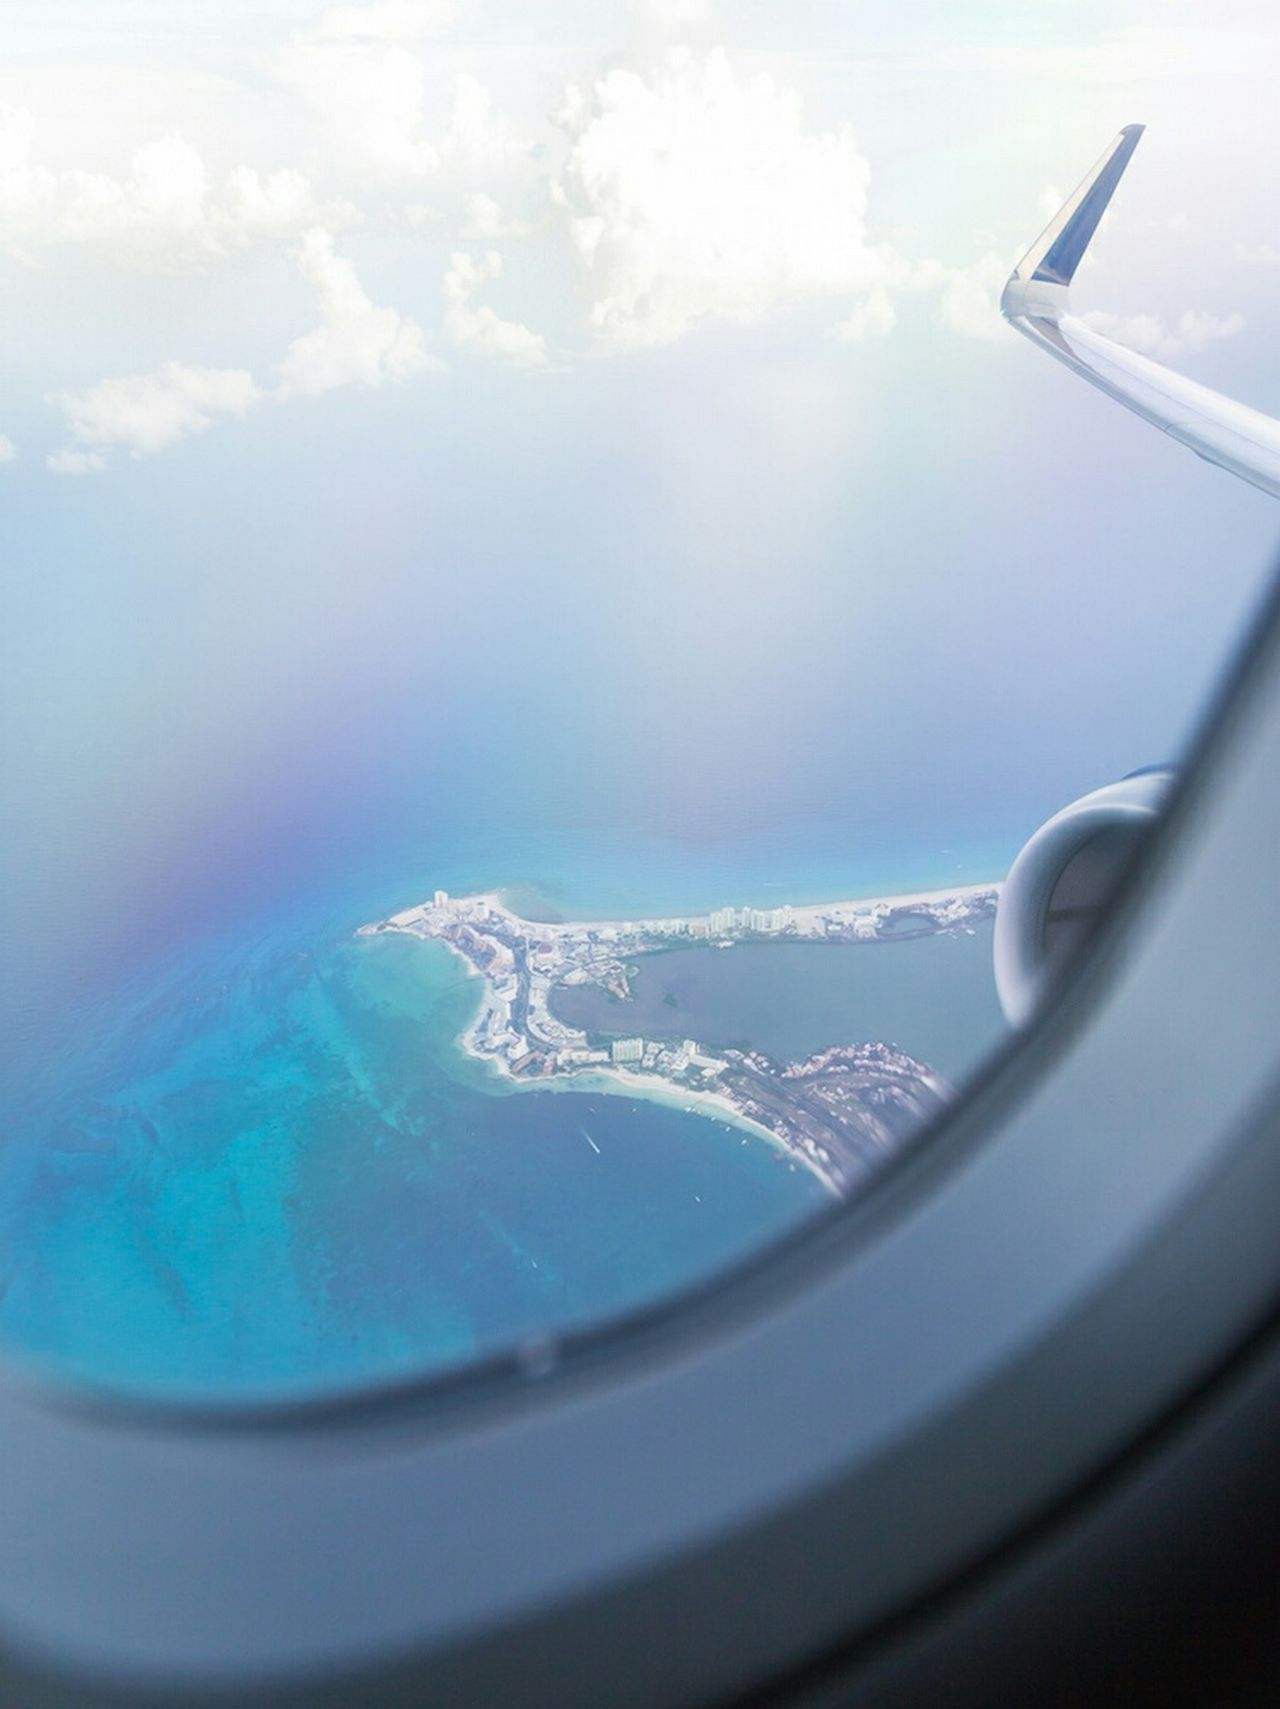 My Trip back from Cancun Mexico Pixelperfectnyc David Gutierrez Mexico Beautiful